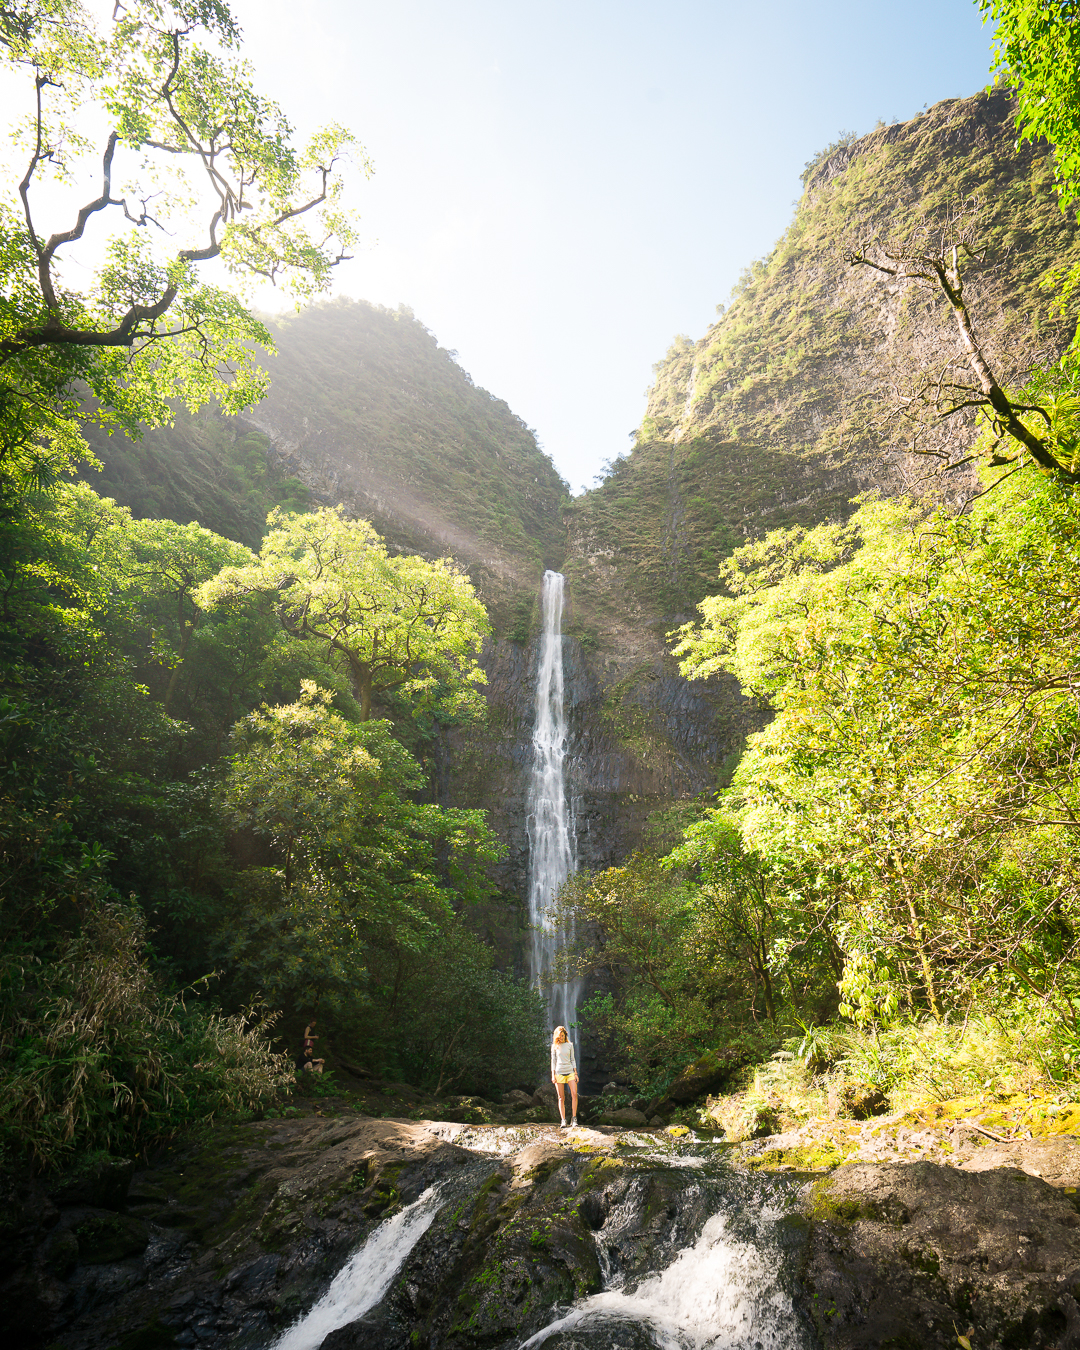 Hanakapi'ai Falls is an additional two miles up Hanakapi'ai Valley.